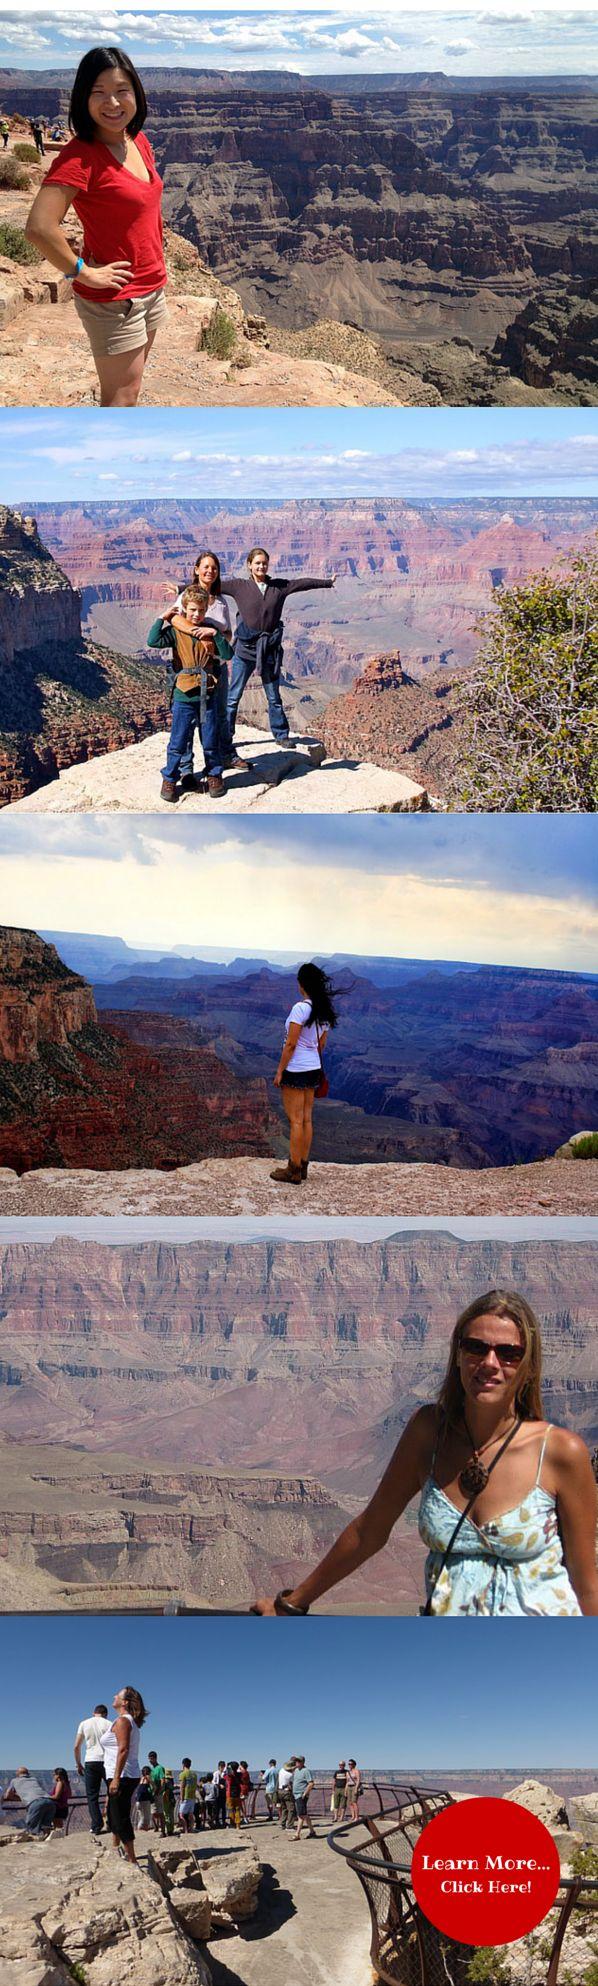 Tour info httpgrandcanyondaytripscomX 194 best Grand Canyon